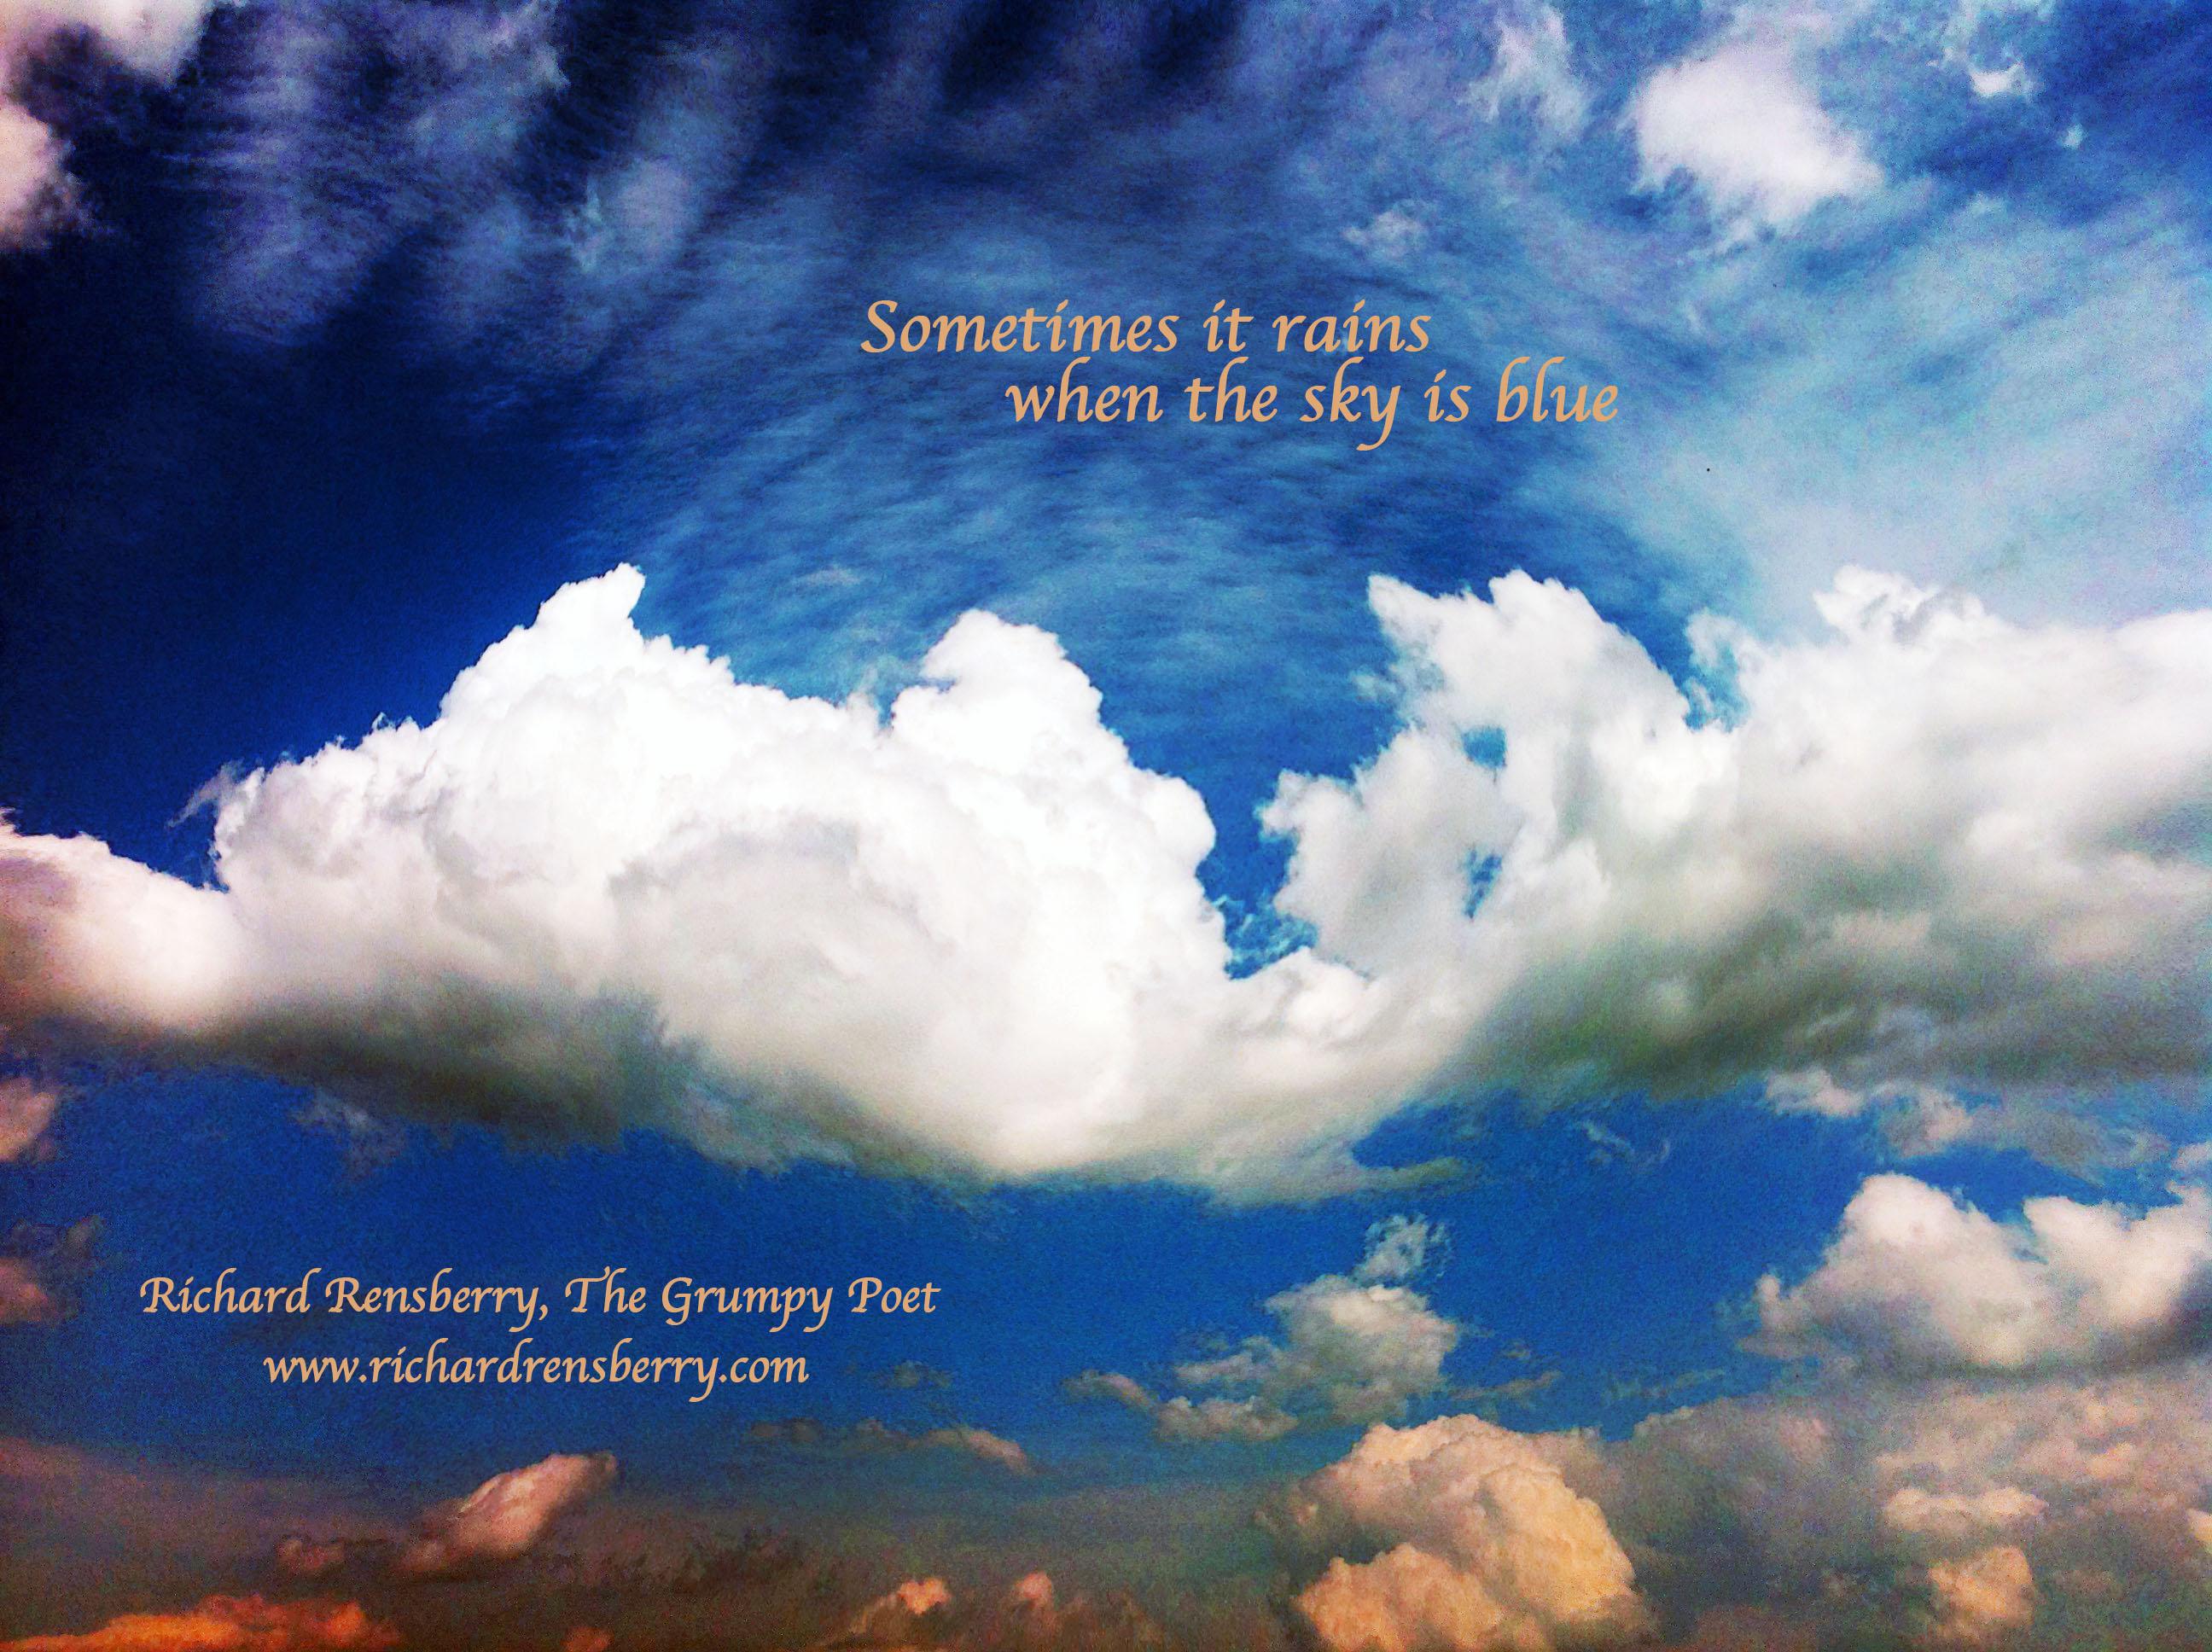 Sometimes it Rains, image XVII